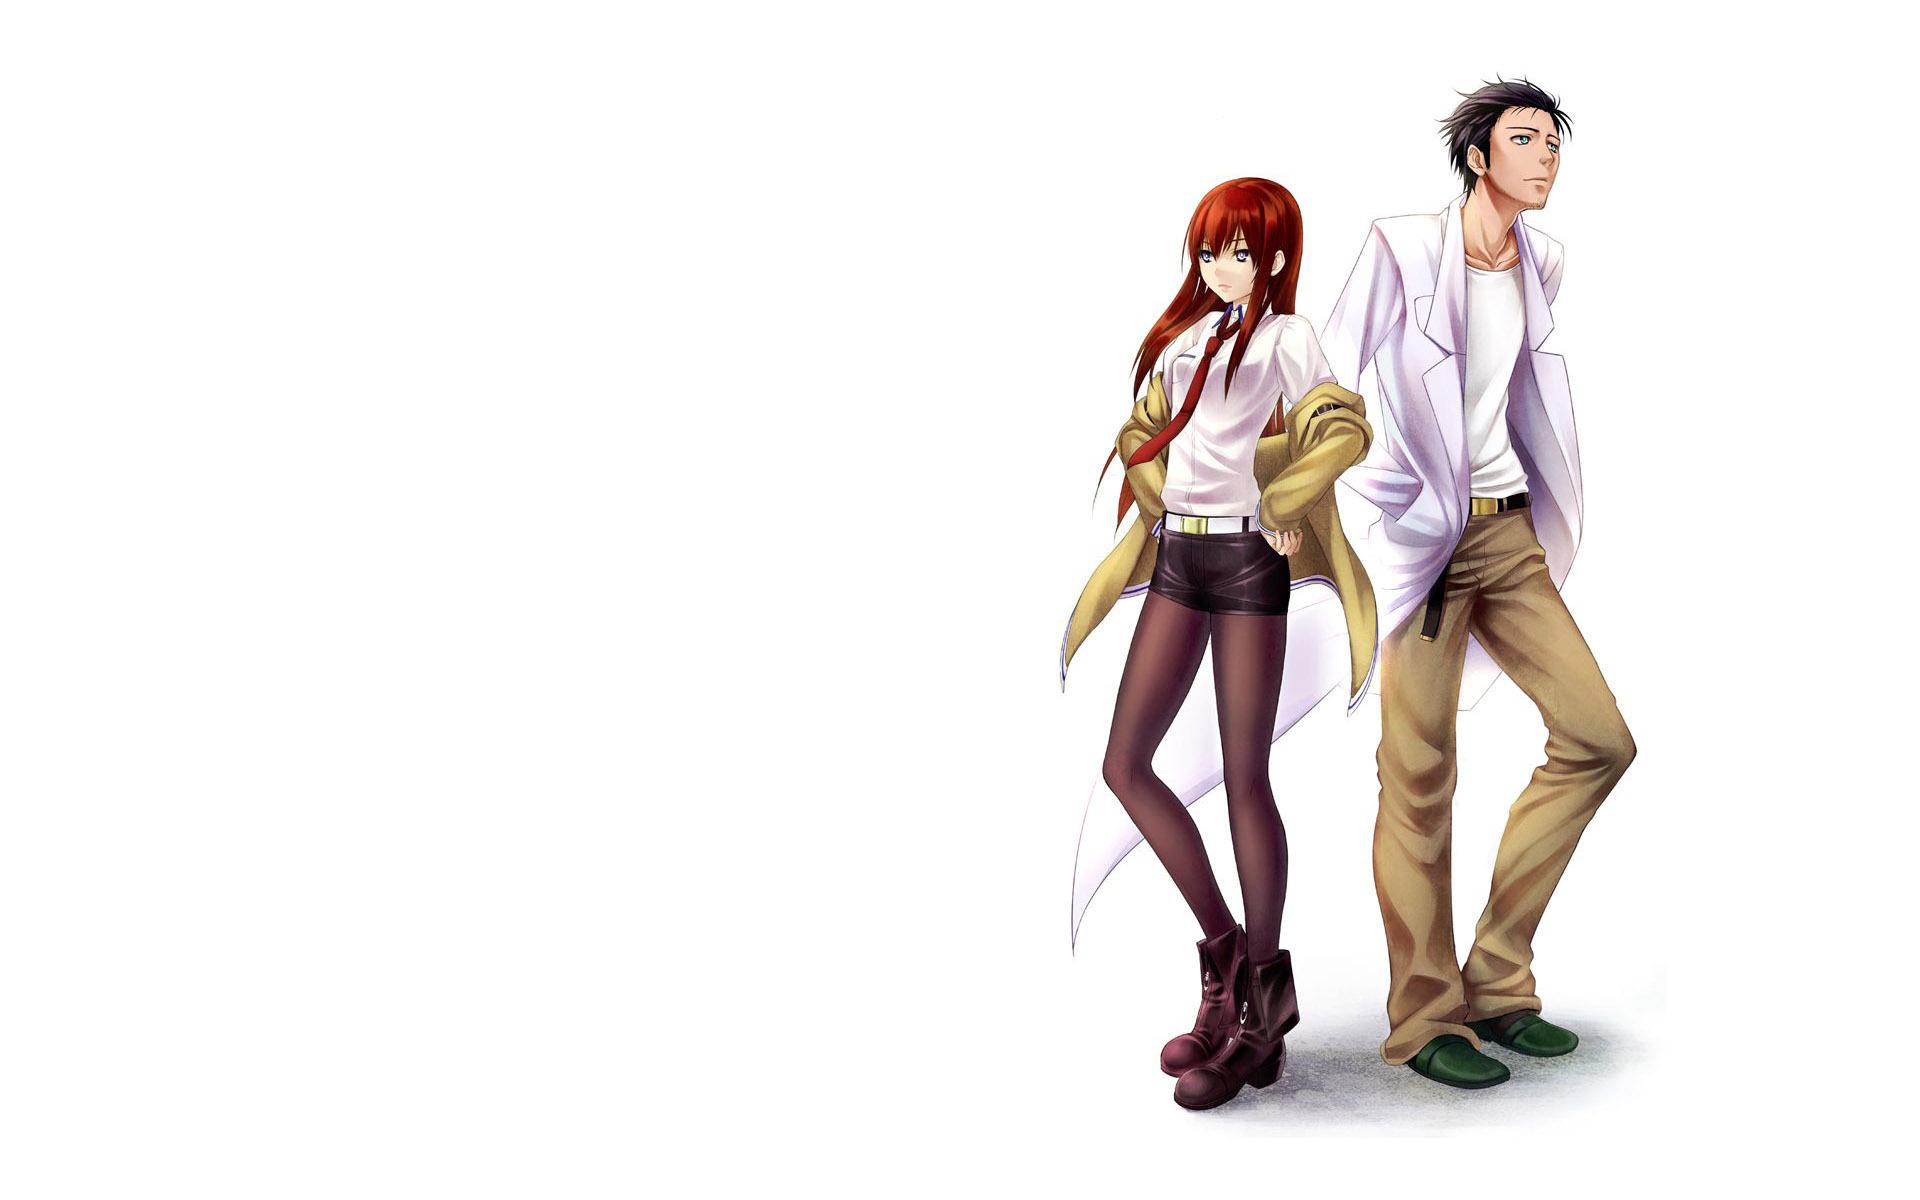 Okabe Steins Gate 6 Free Hd Wallpaper - Animewp.com